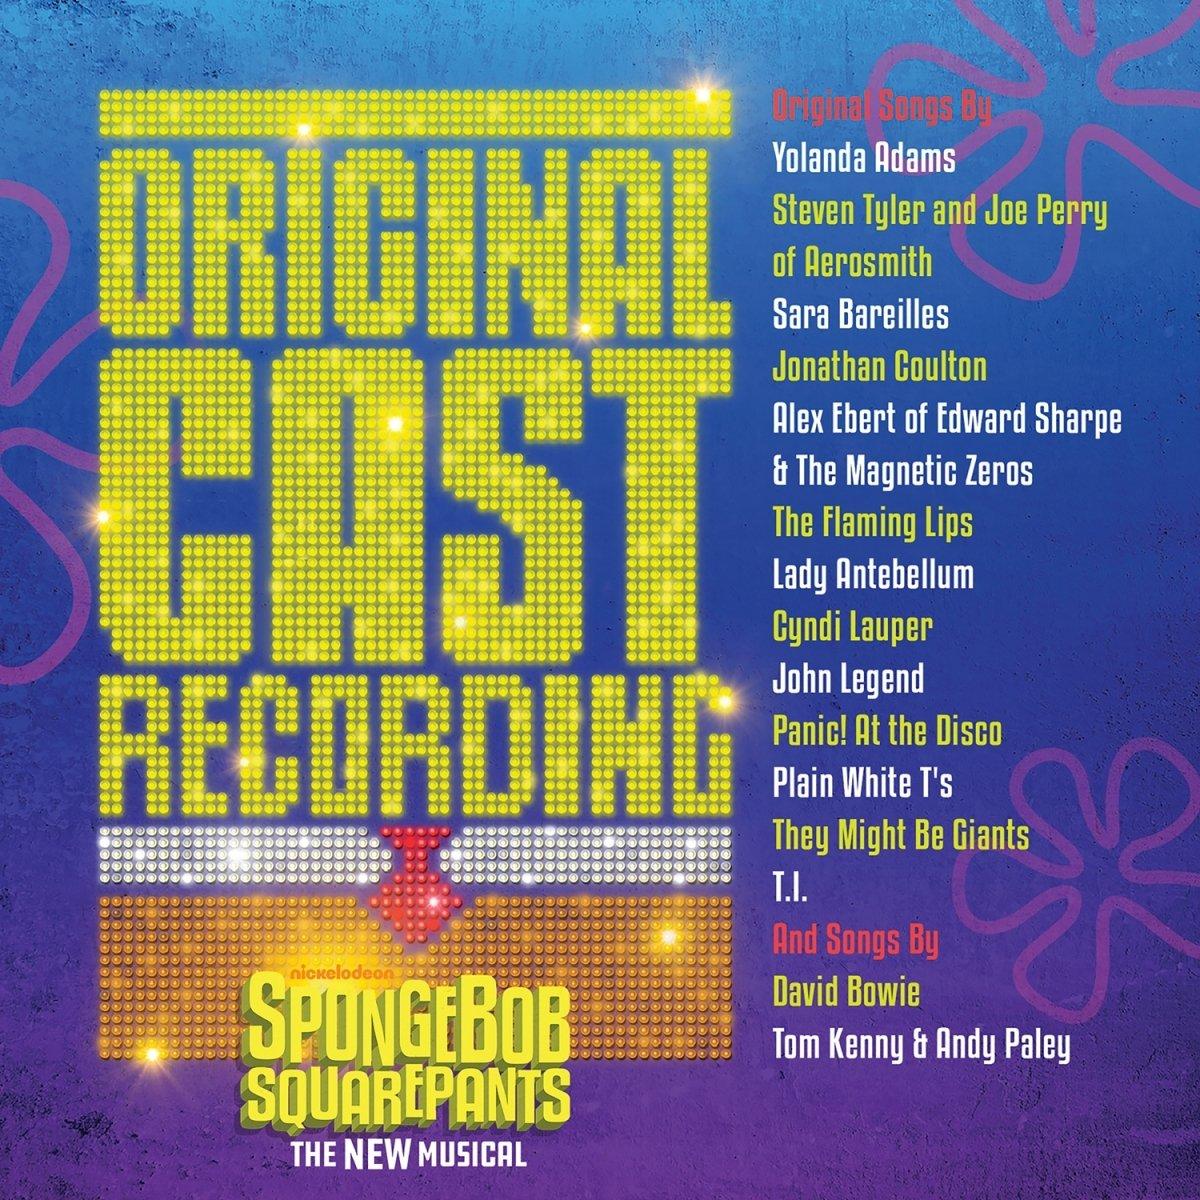 SpongeBob SquarePants, The New Musical (Original Cast Recording) by Masterworks